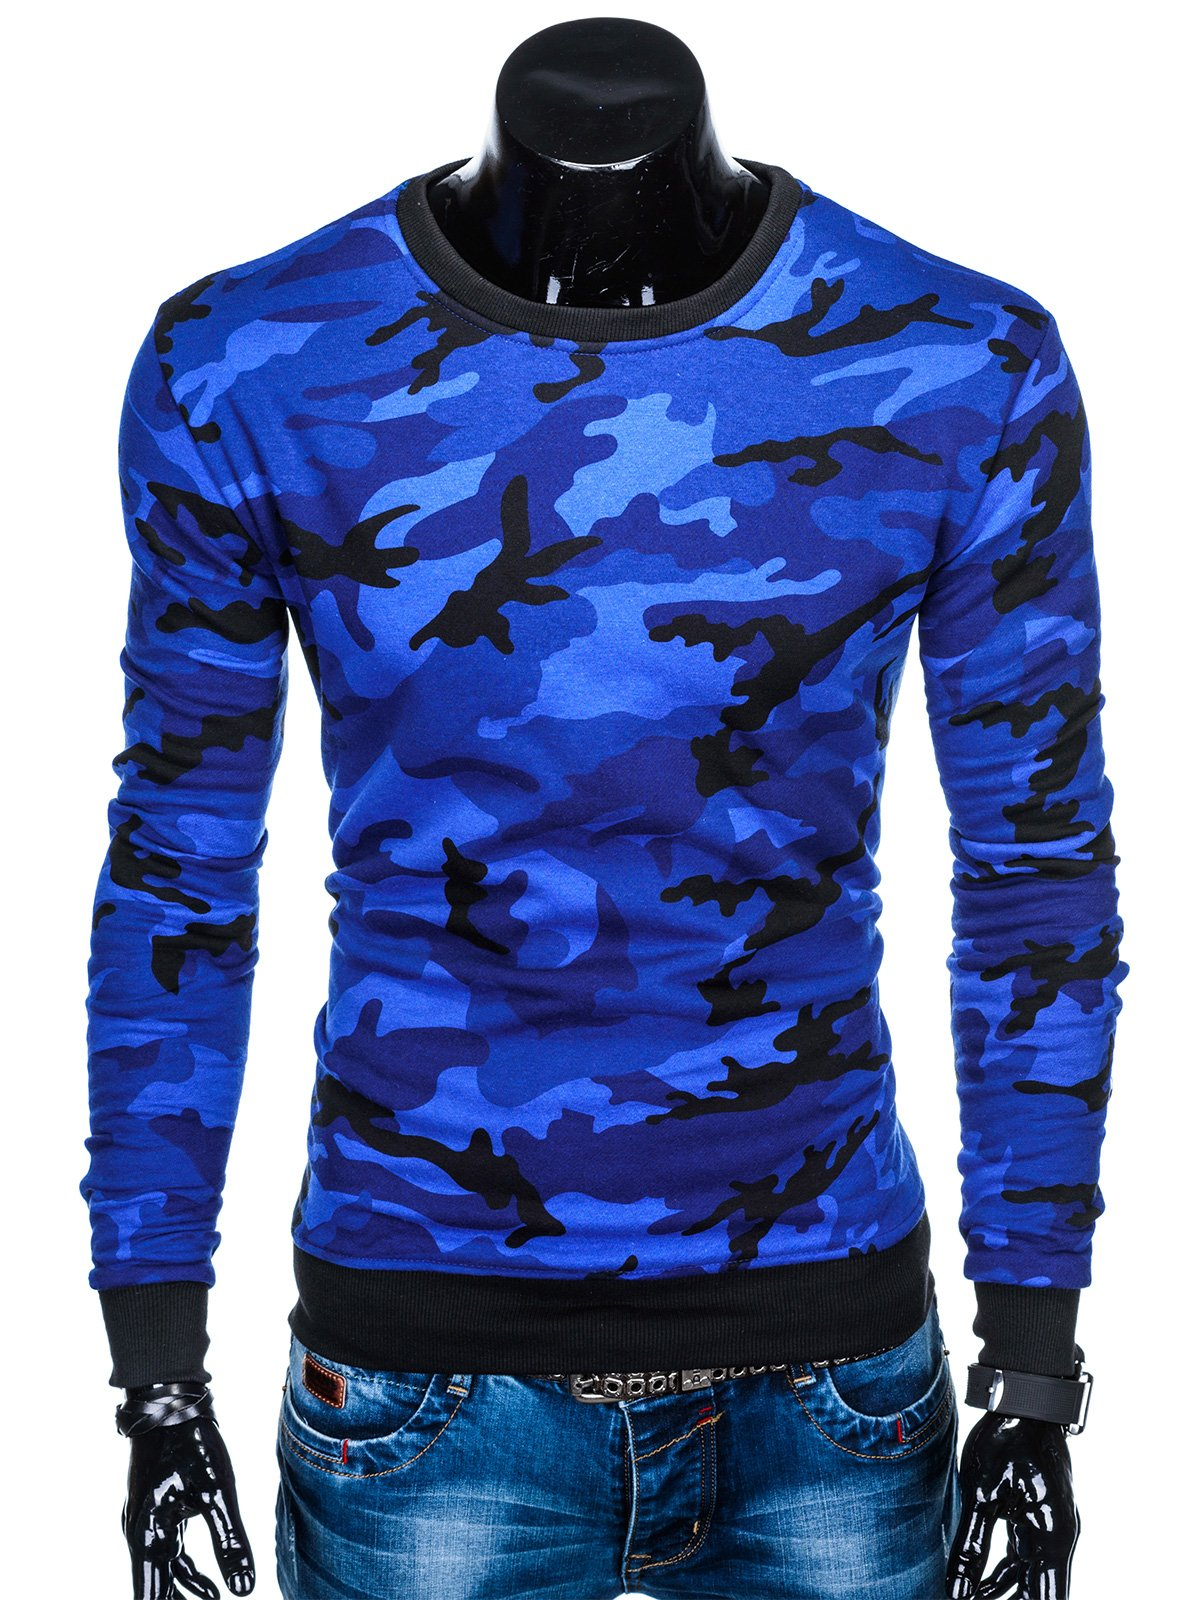 a5536c4ef8 Bluza męska bez kaptura 885B - niebieska moro niebieski